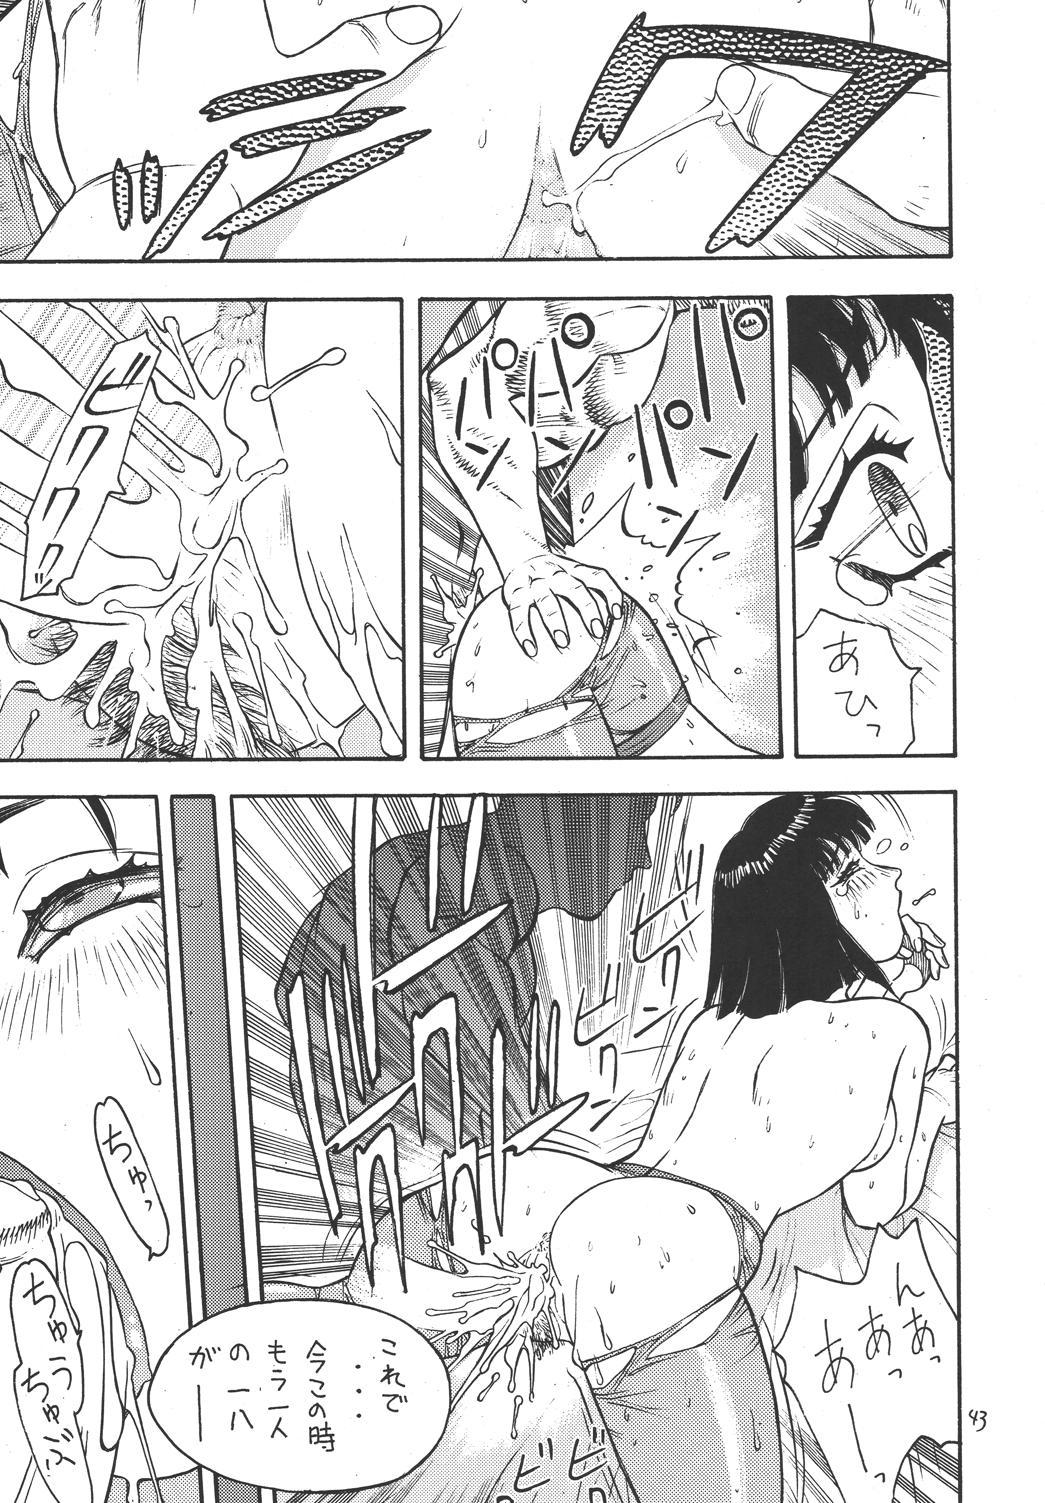 Fighters Giga Comics Round 1 41